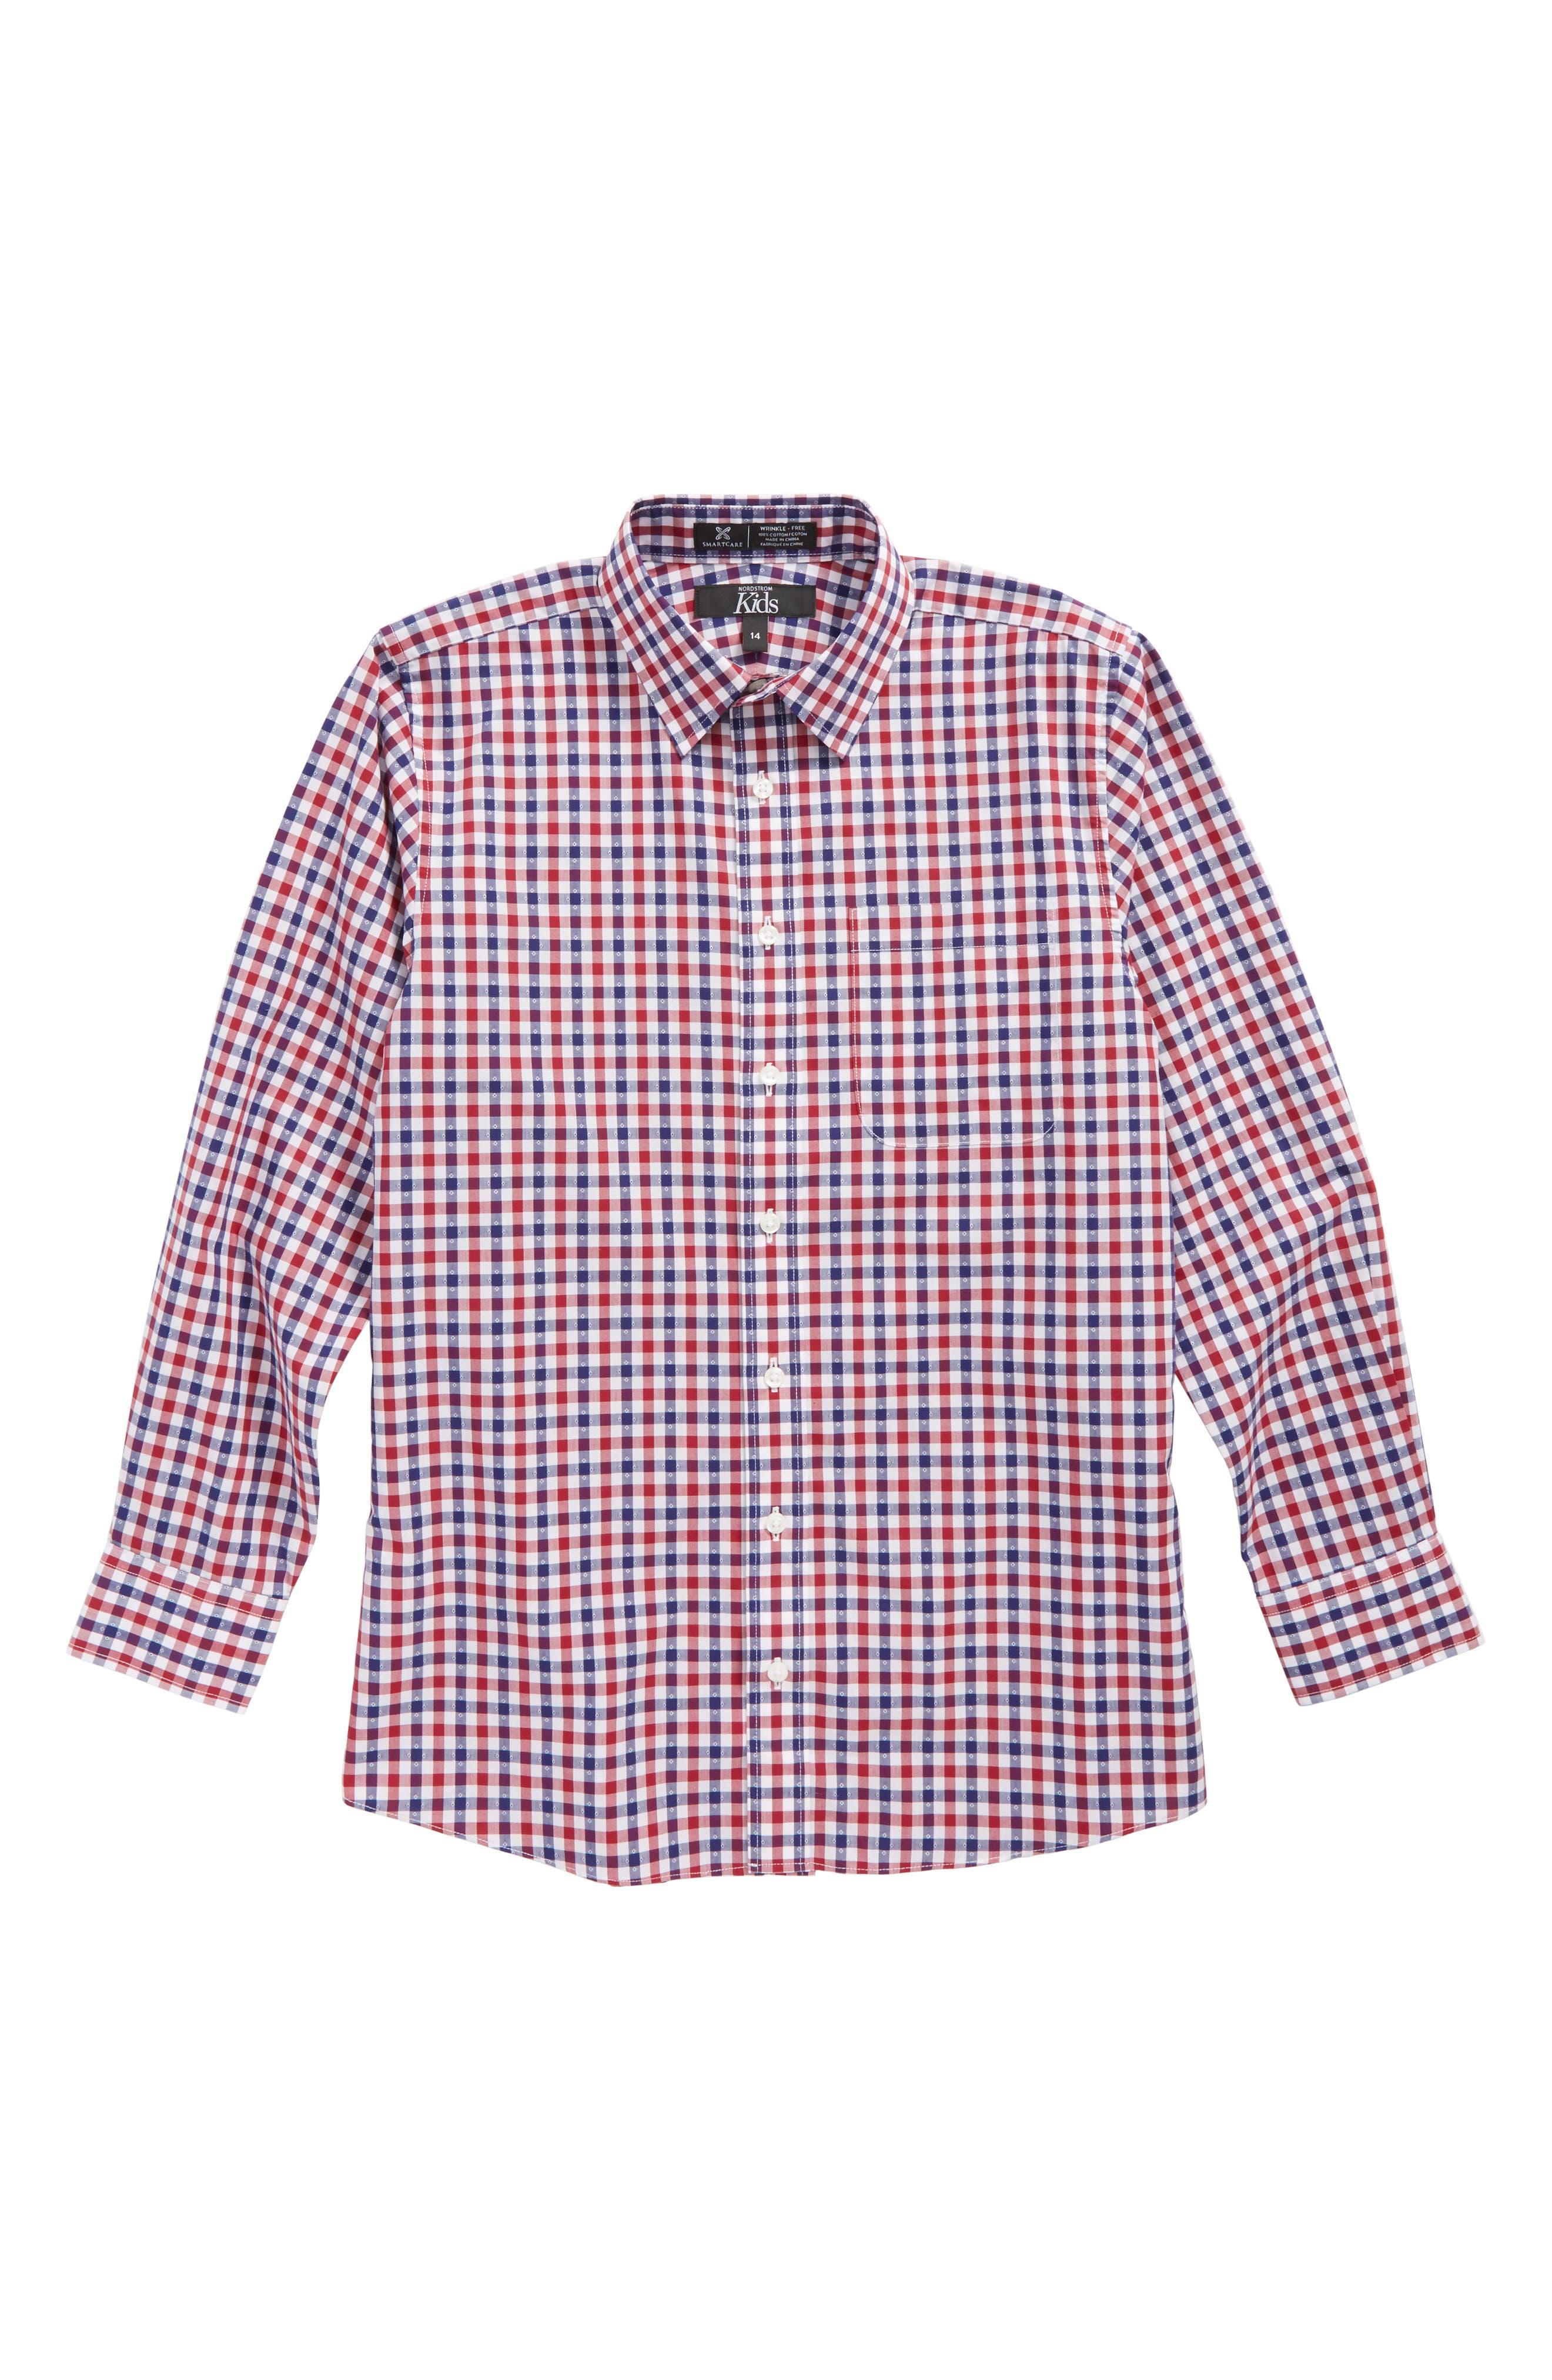 Main Image - Nordstrom Dot Gingham Sport Shirt (Big Boys)